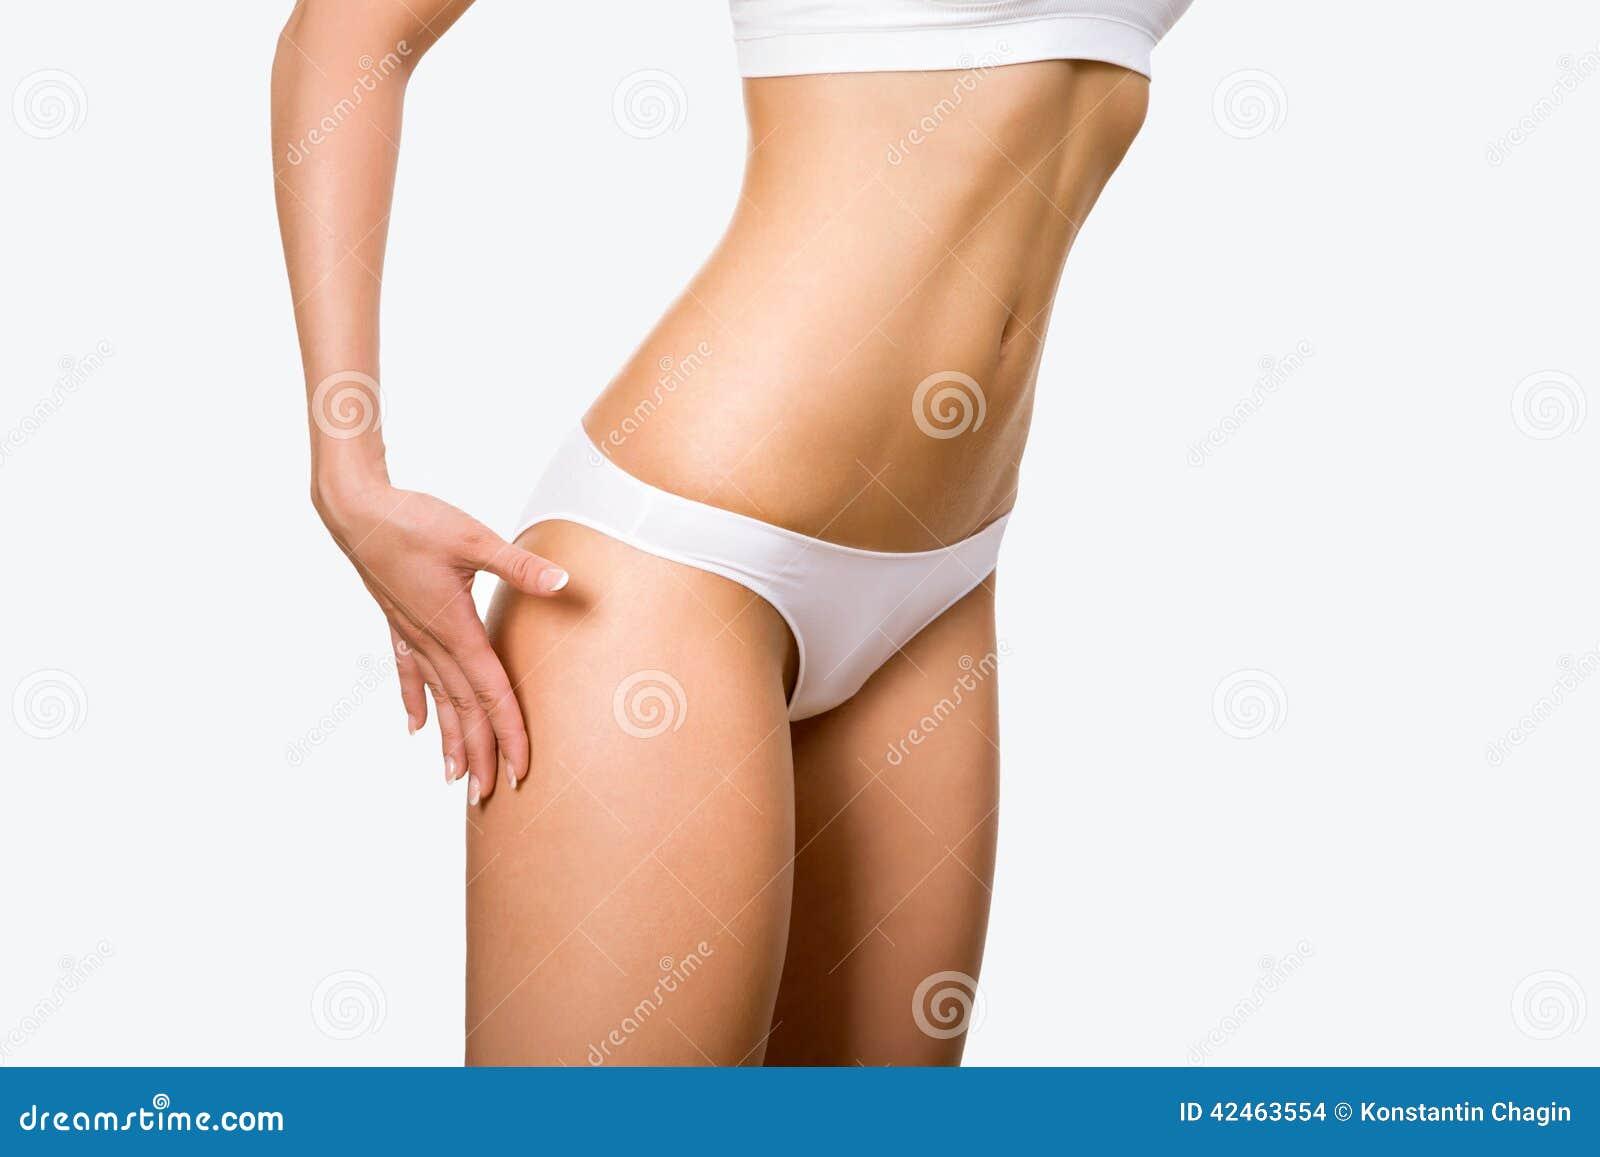 Der Körper der gebräunten Frau